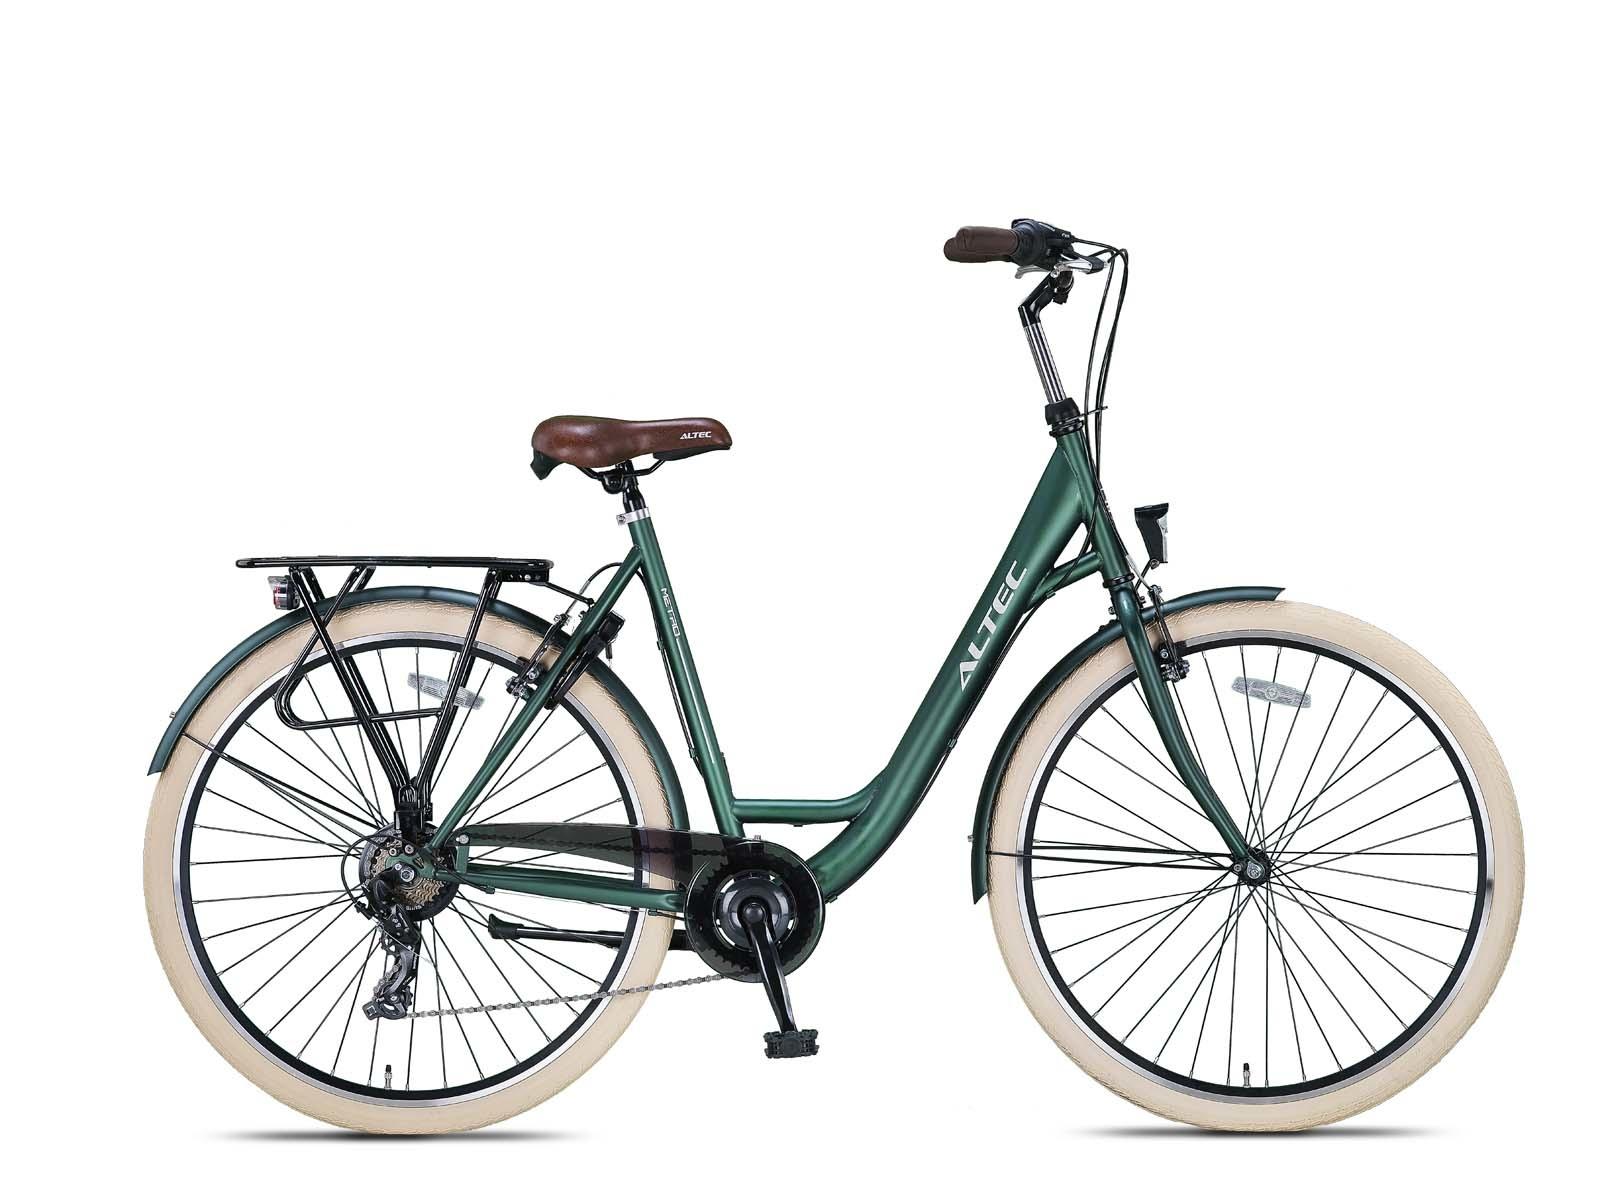 Altec Metro Plus Damesfiets 28 inch 55cm Army Green 7v online kopen